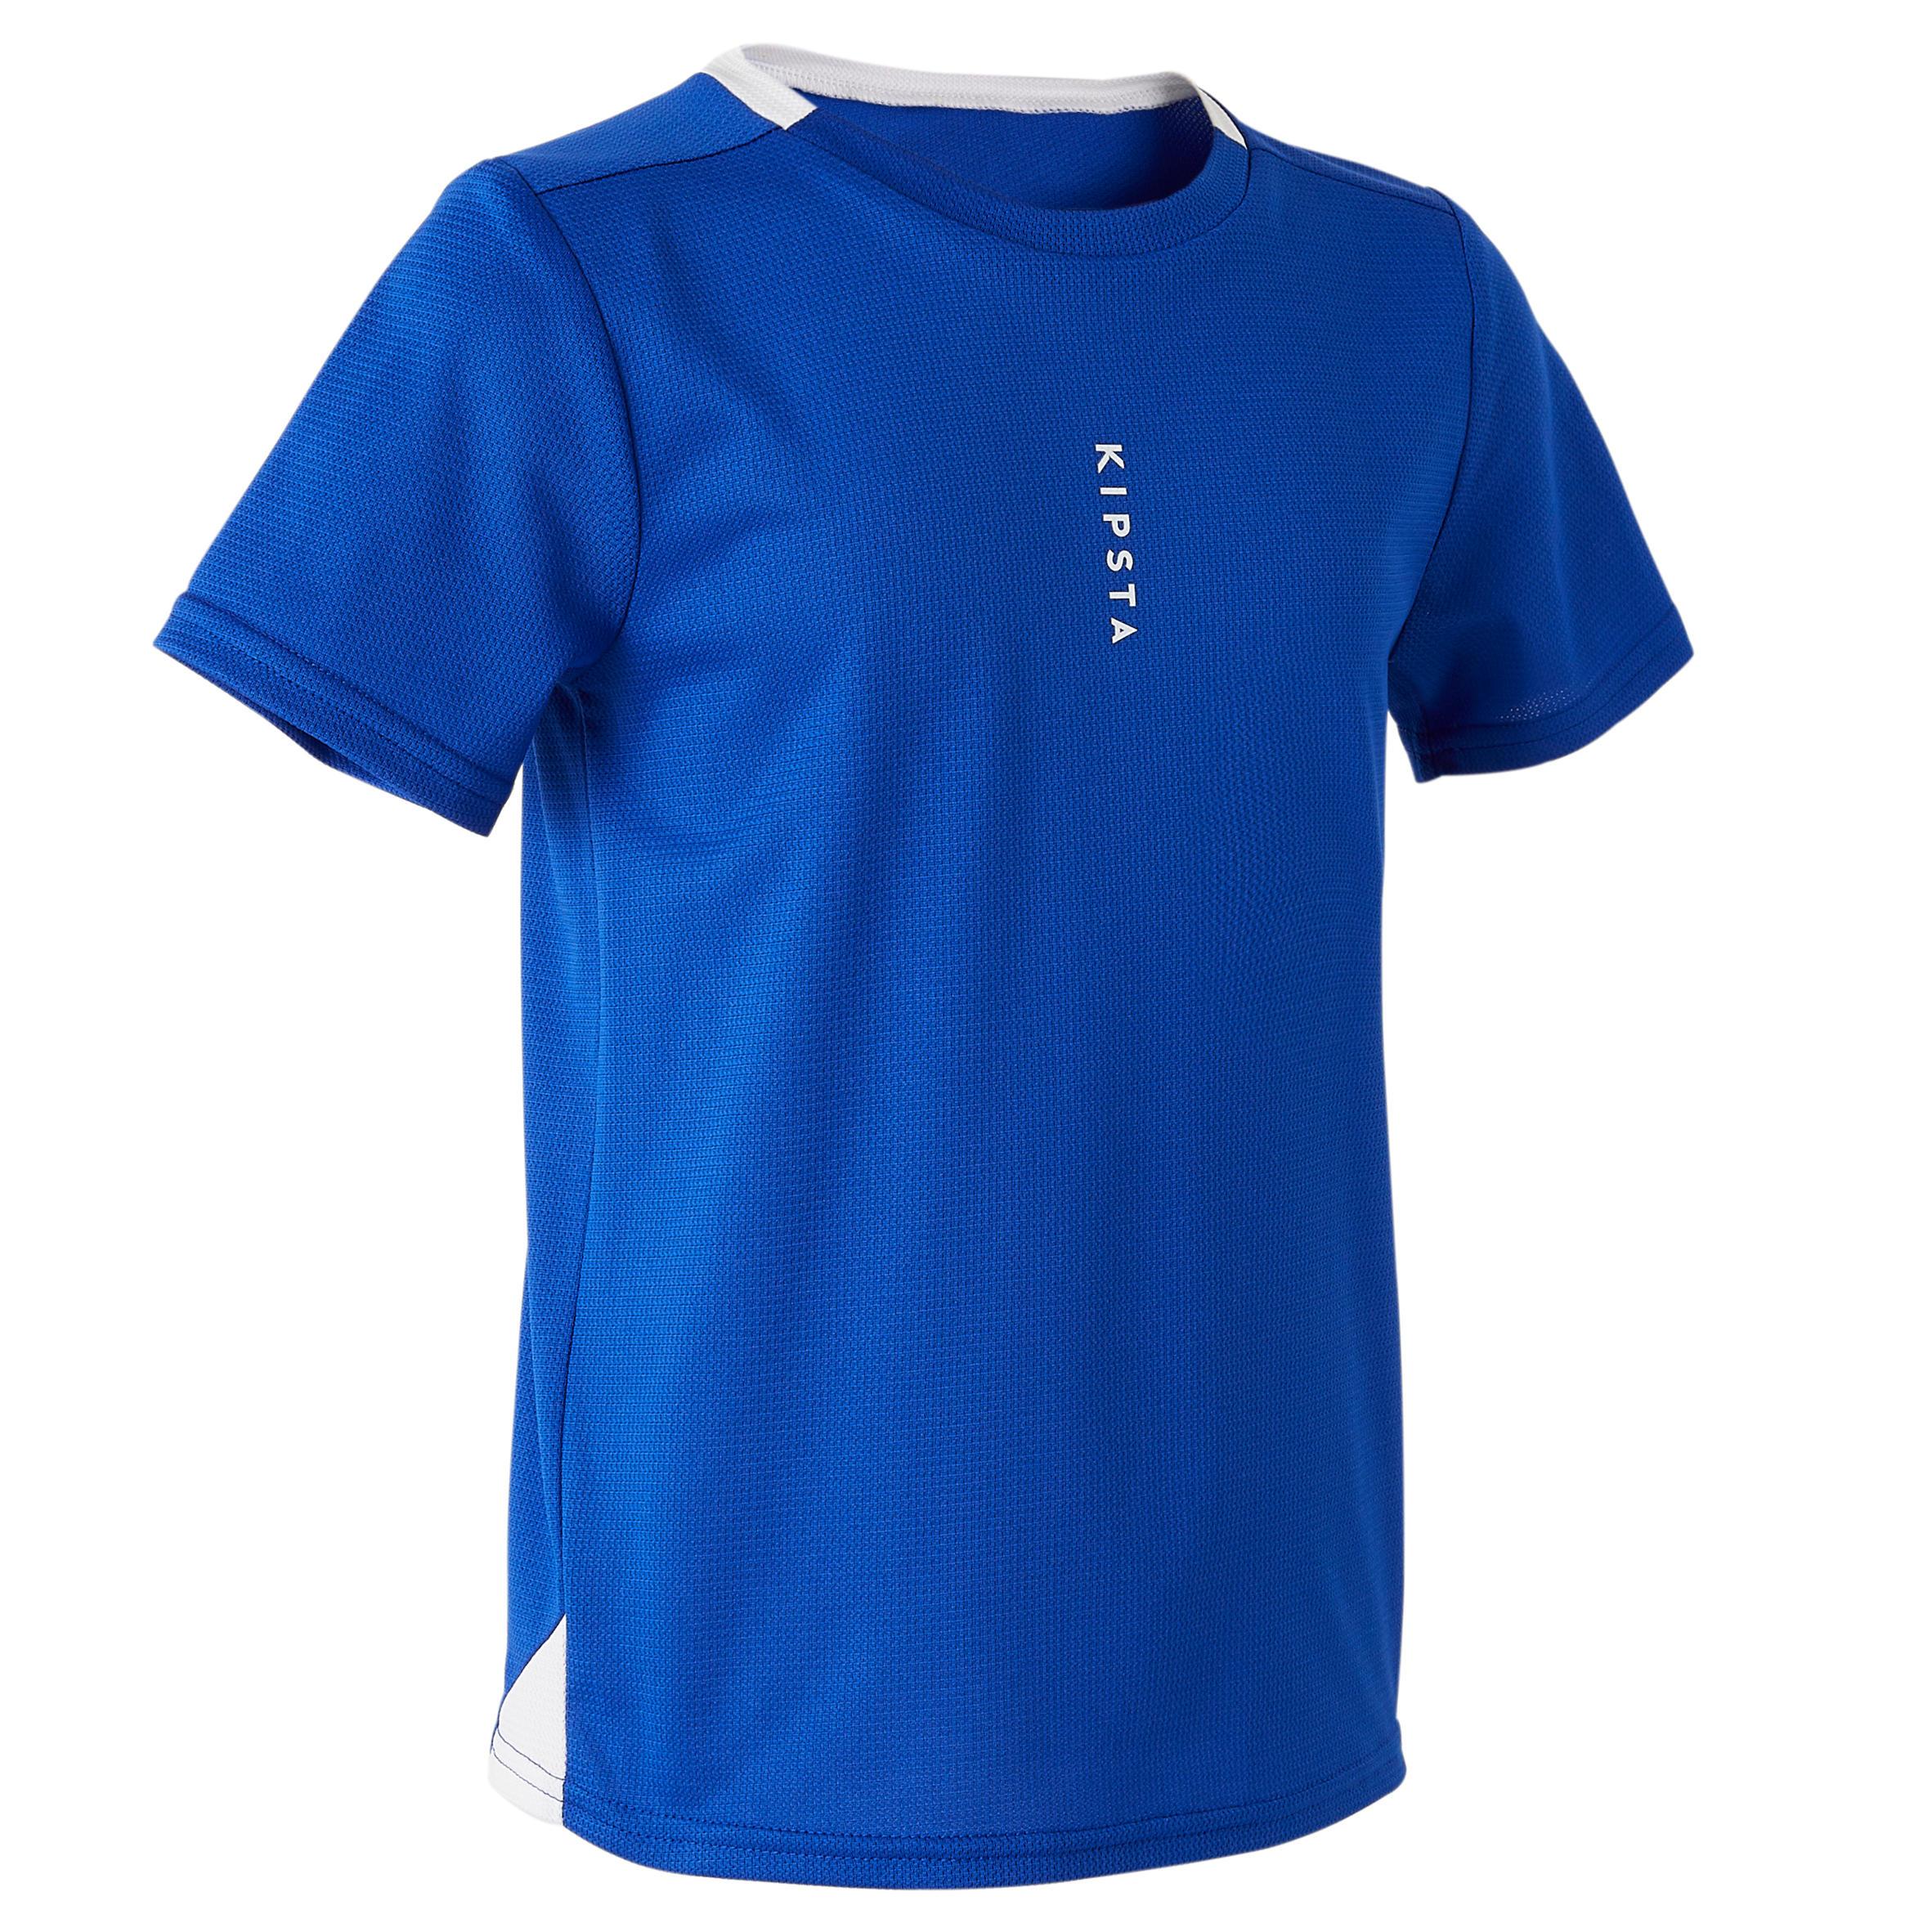 Kipsta Voetbalshirt kind F100 blauw